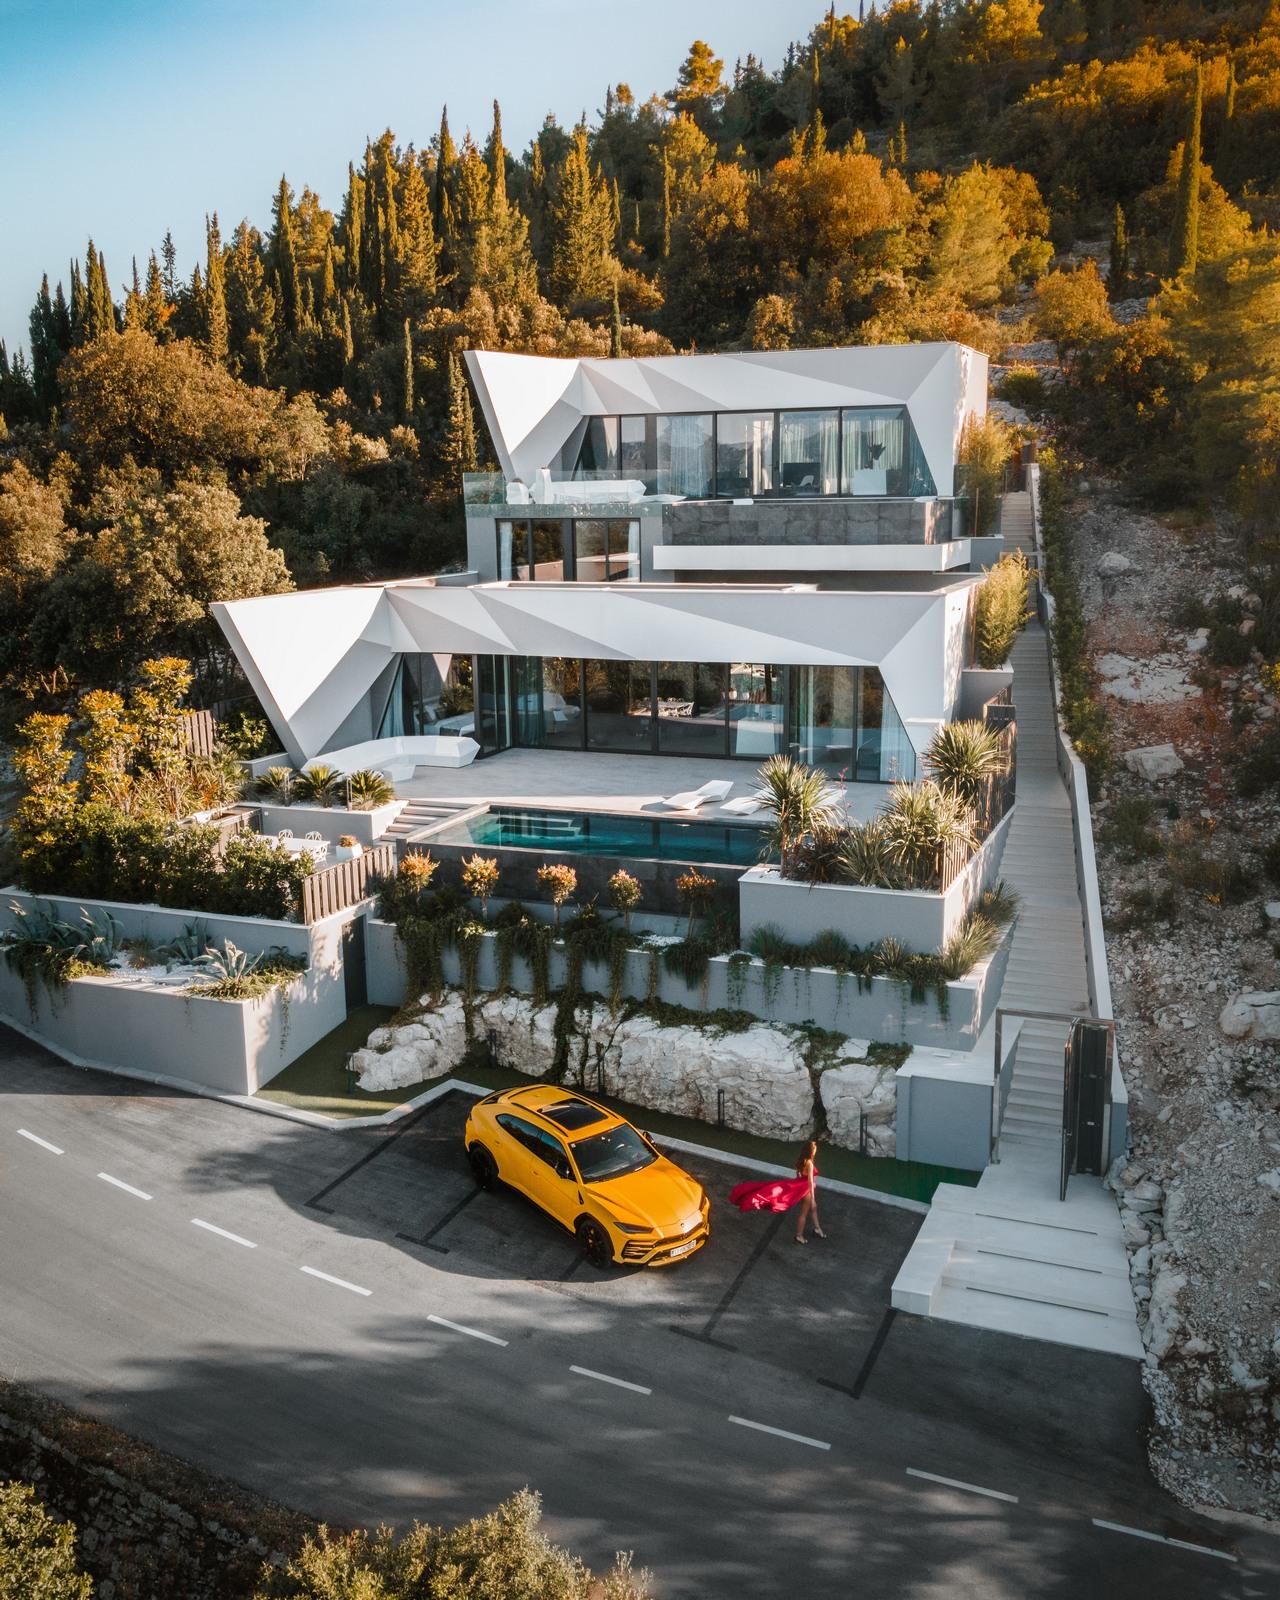 Luxury Villa Korcula Diamond with 2 infinty pool - the most exclusive villa rental in Croatia